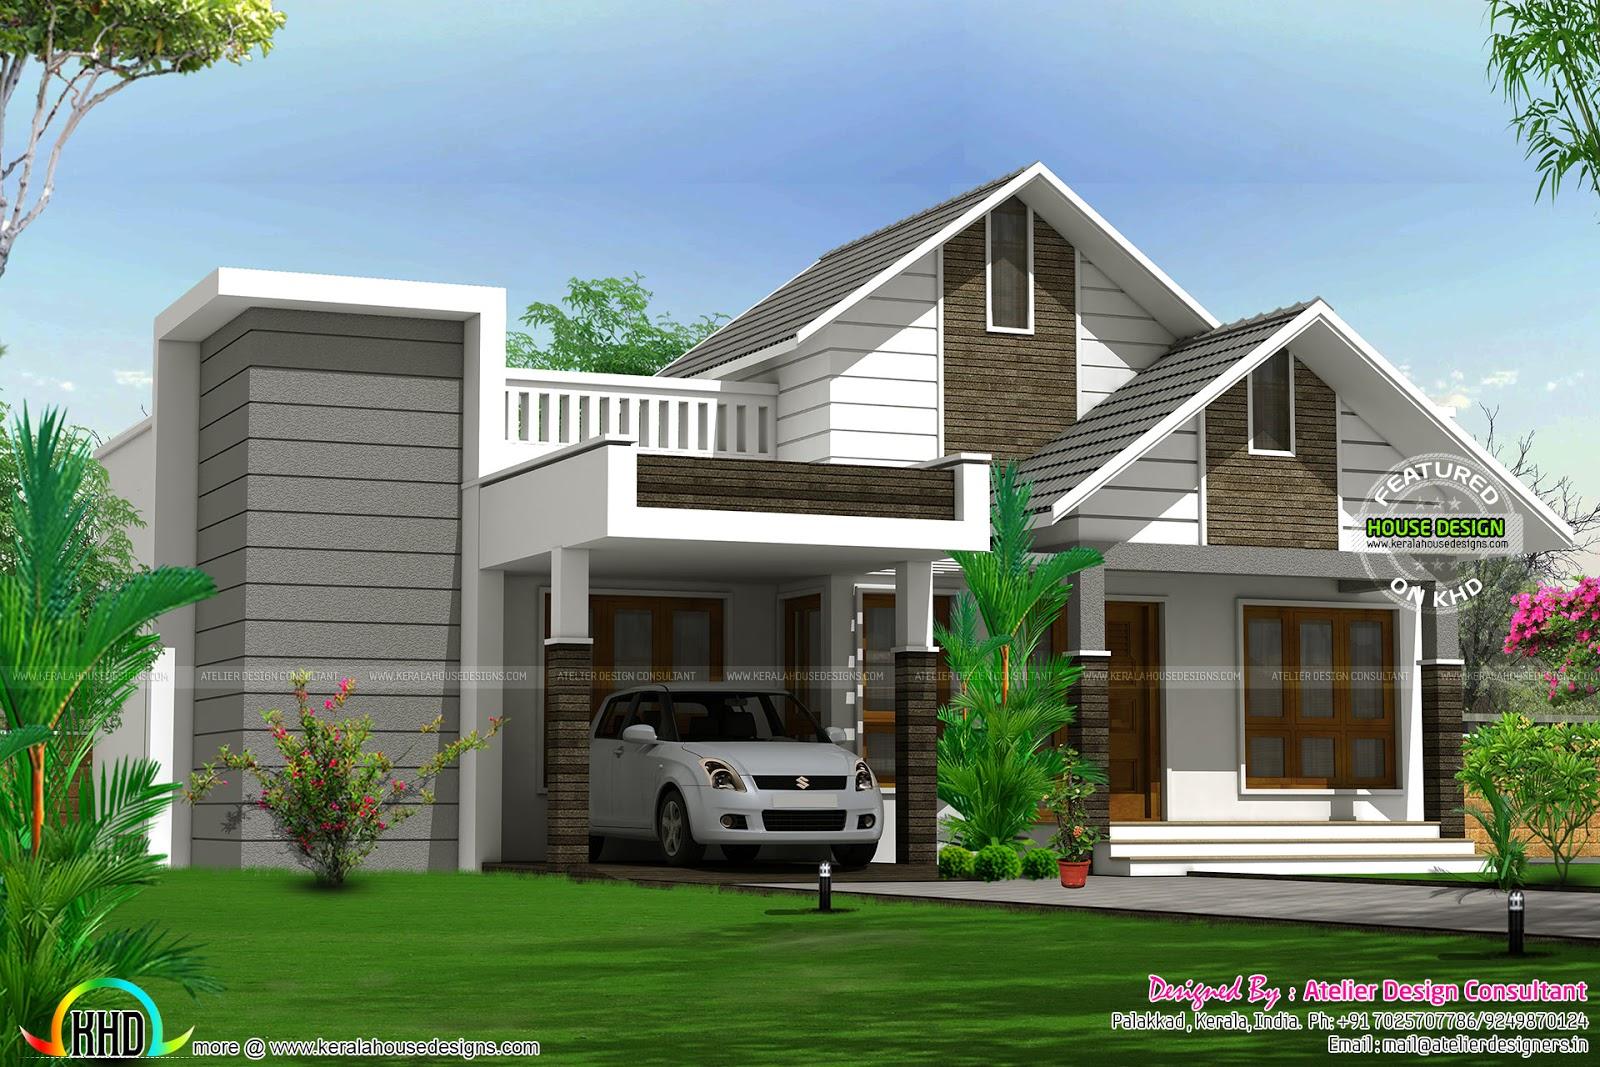 please follow kerala home design - Home Design Consultant